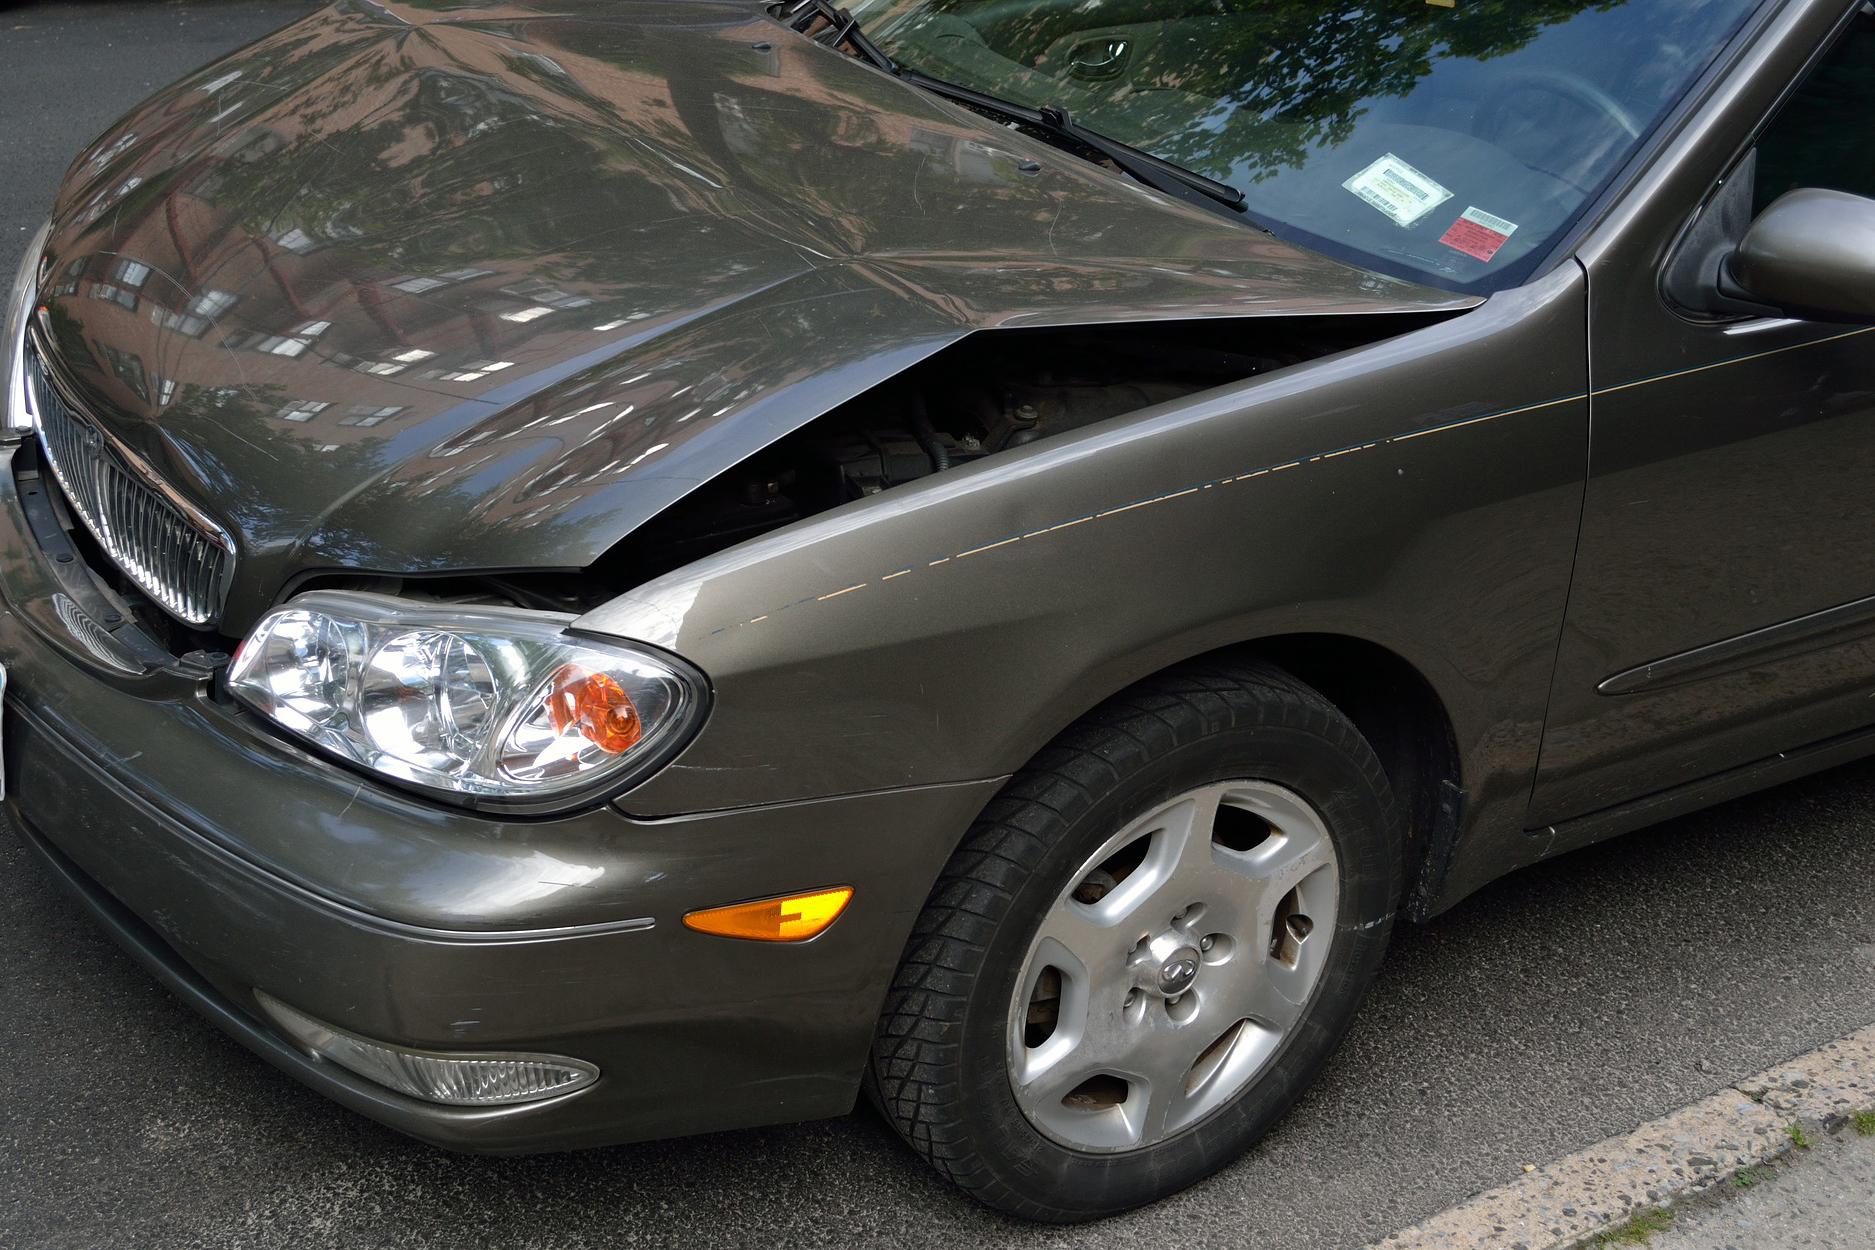 Auto Dent Repair in Dallas, Fort Worth, Plano TX, Denton TX, McKinney TX